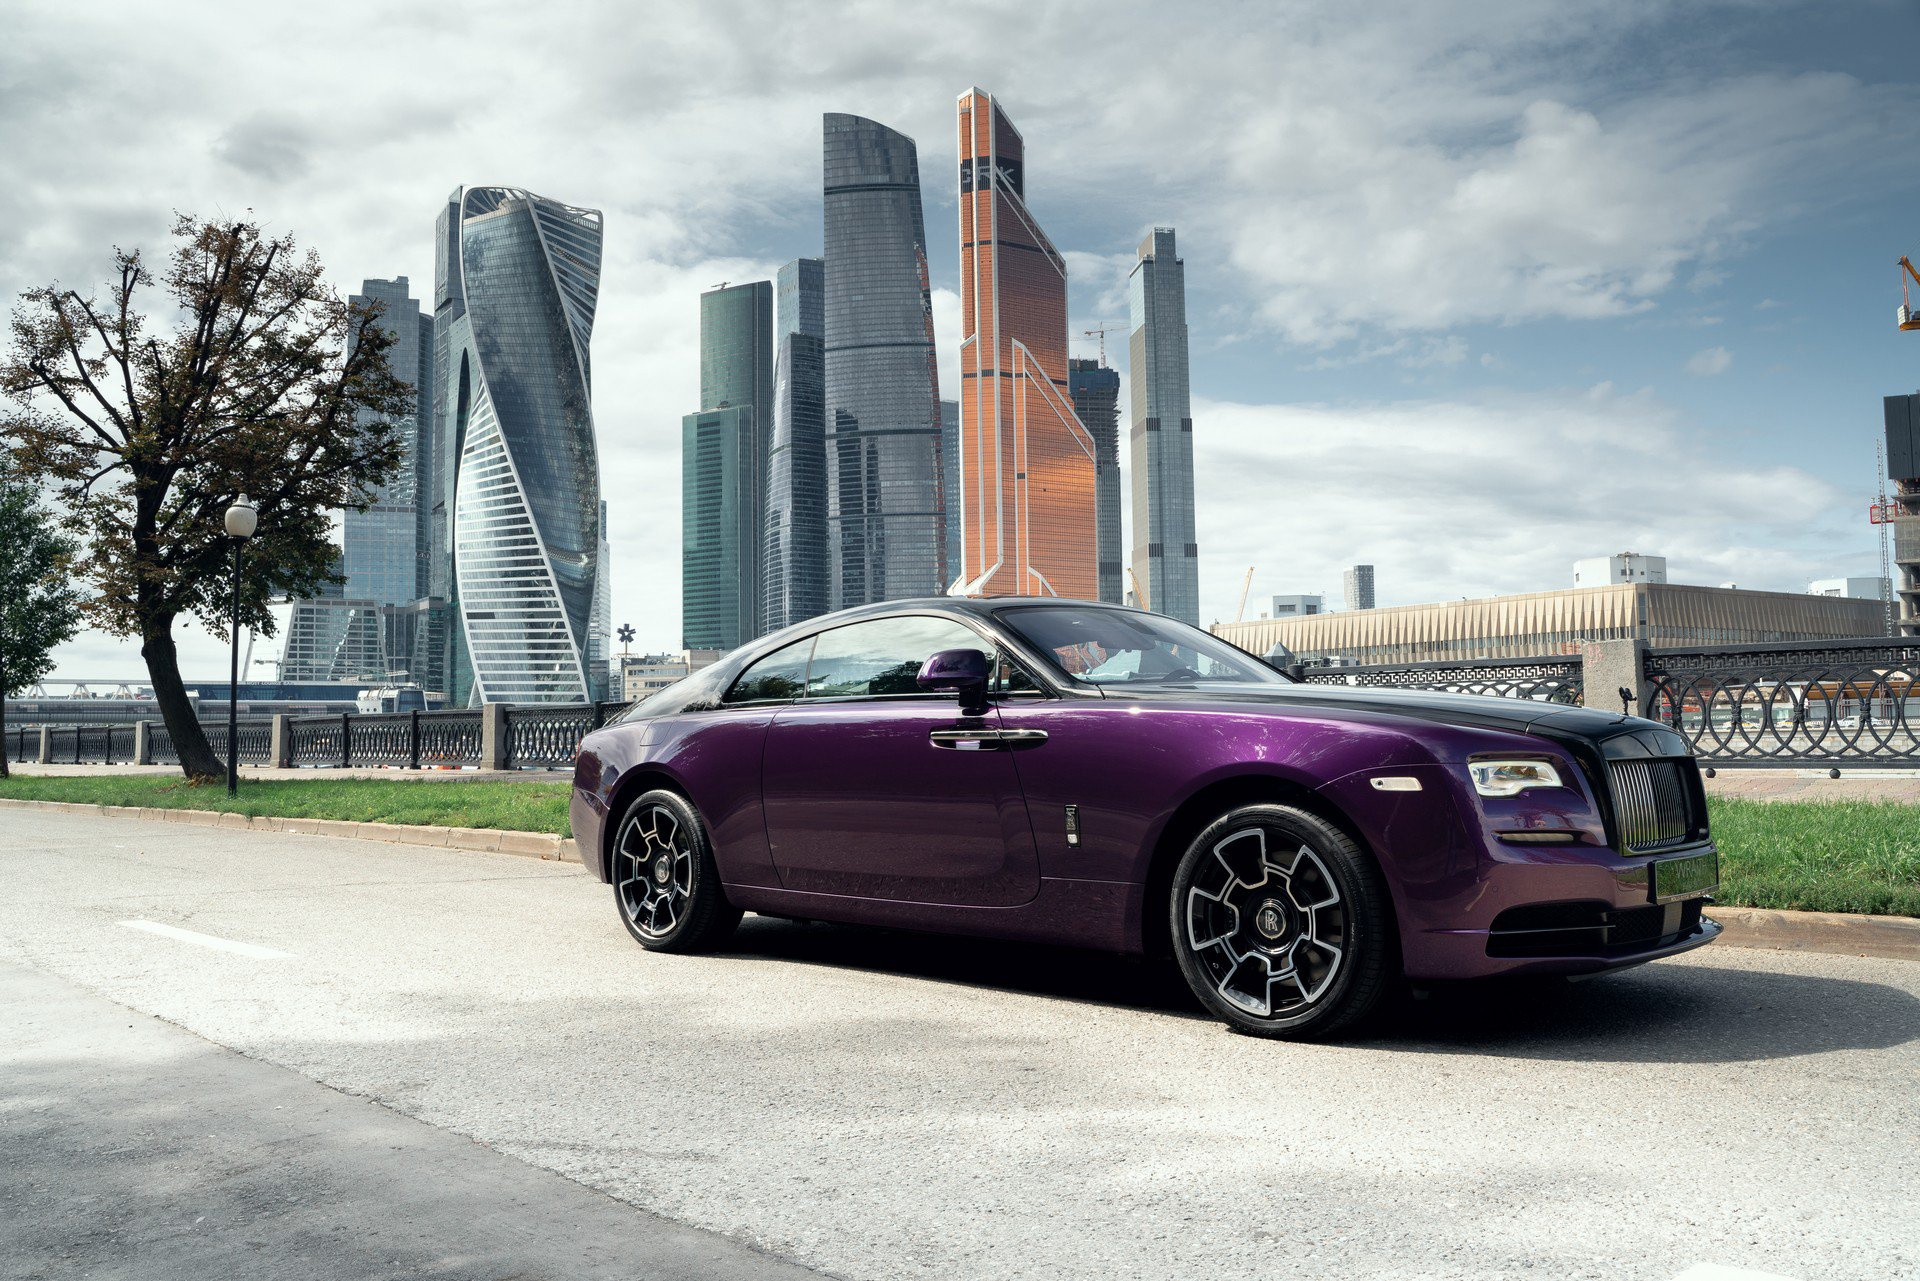 Ngam bo suu tap Rolls-Royce dac biet 'Dem Moscow' hinh anh 2